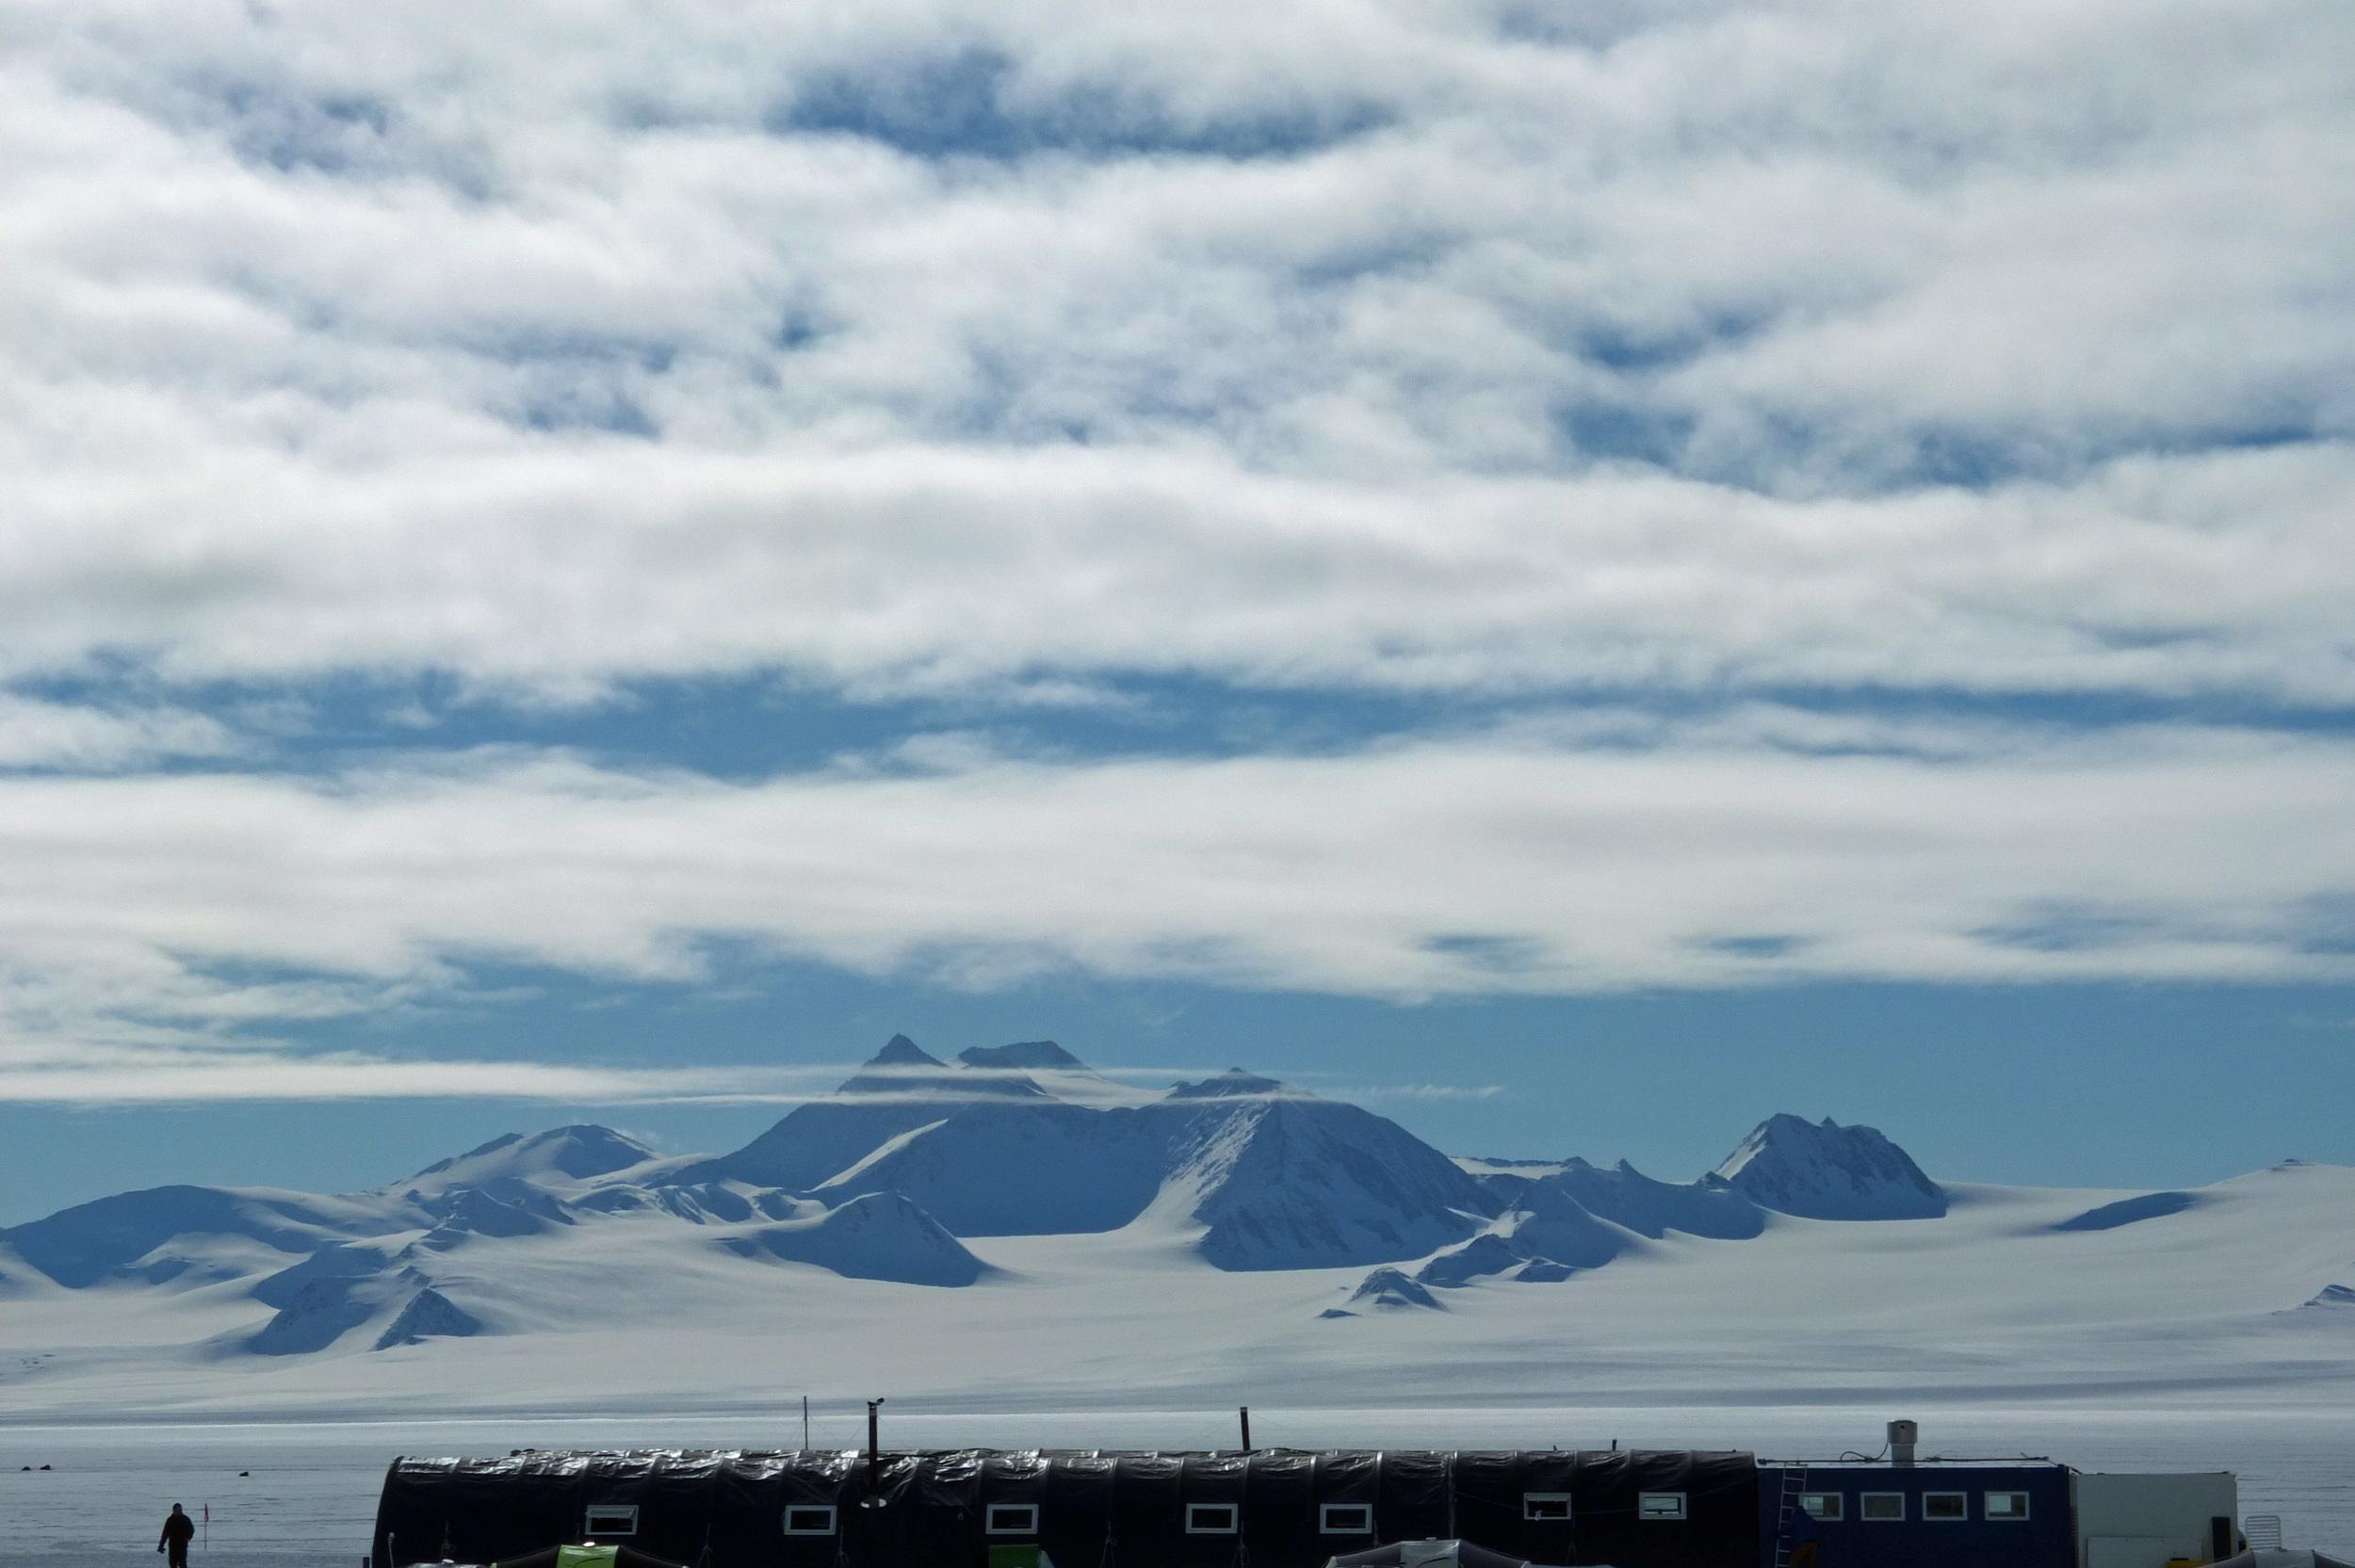 First Scot to complete three polar marathons   Audrey McIntosh    Read More